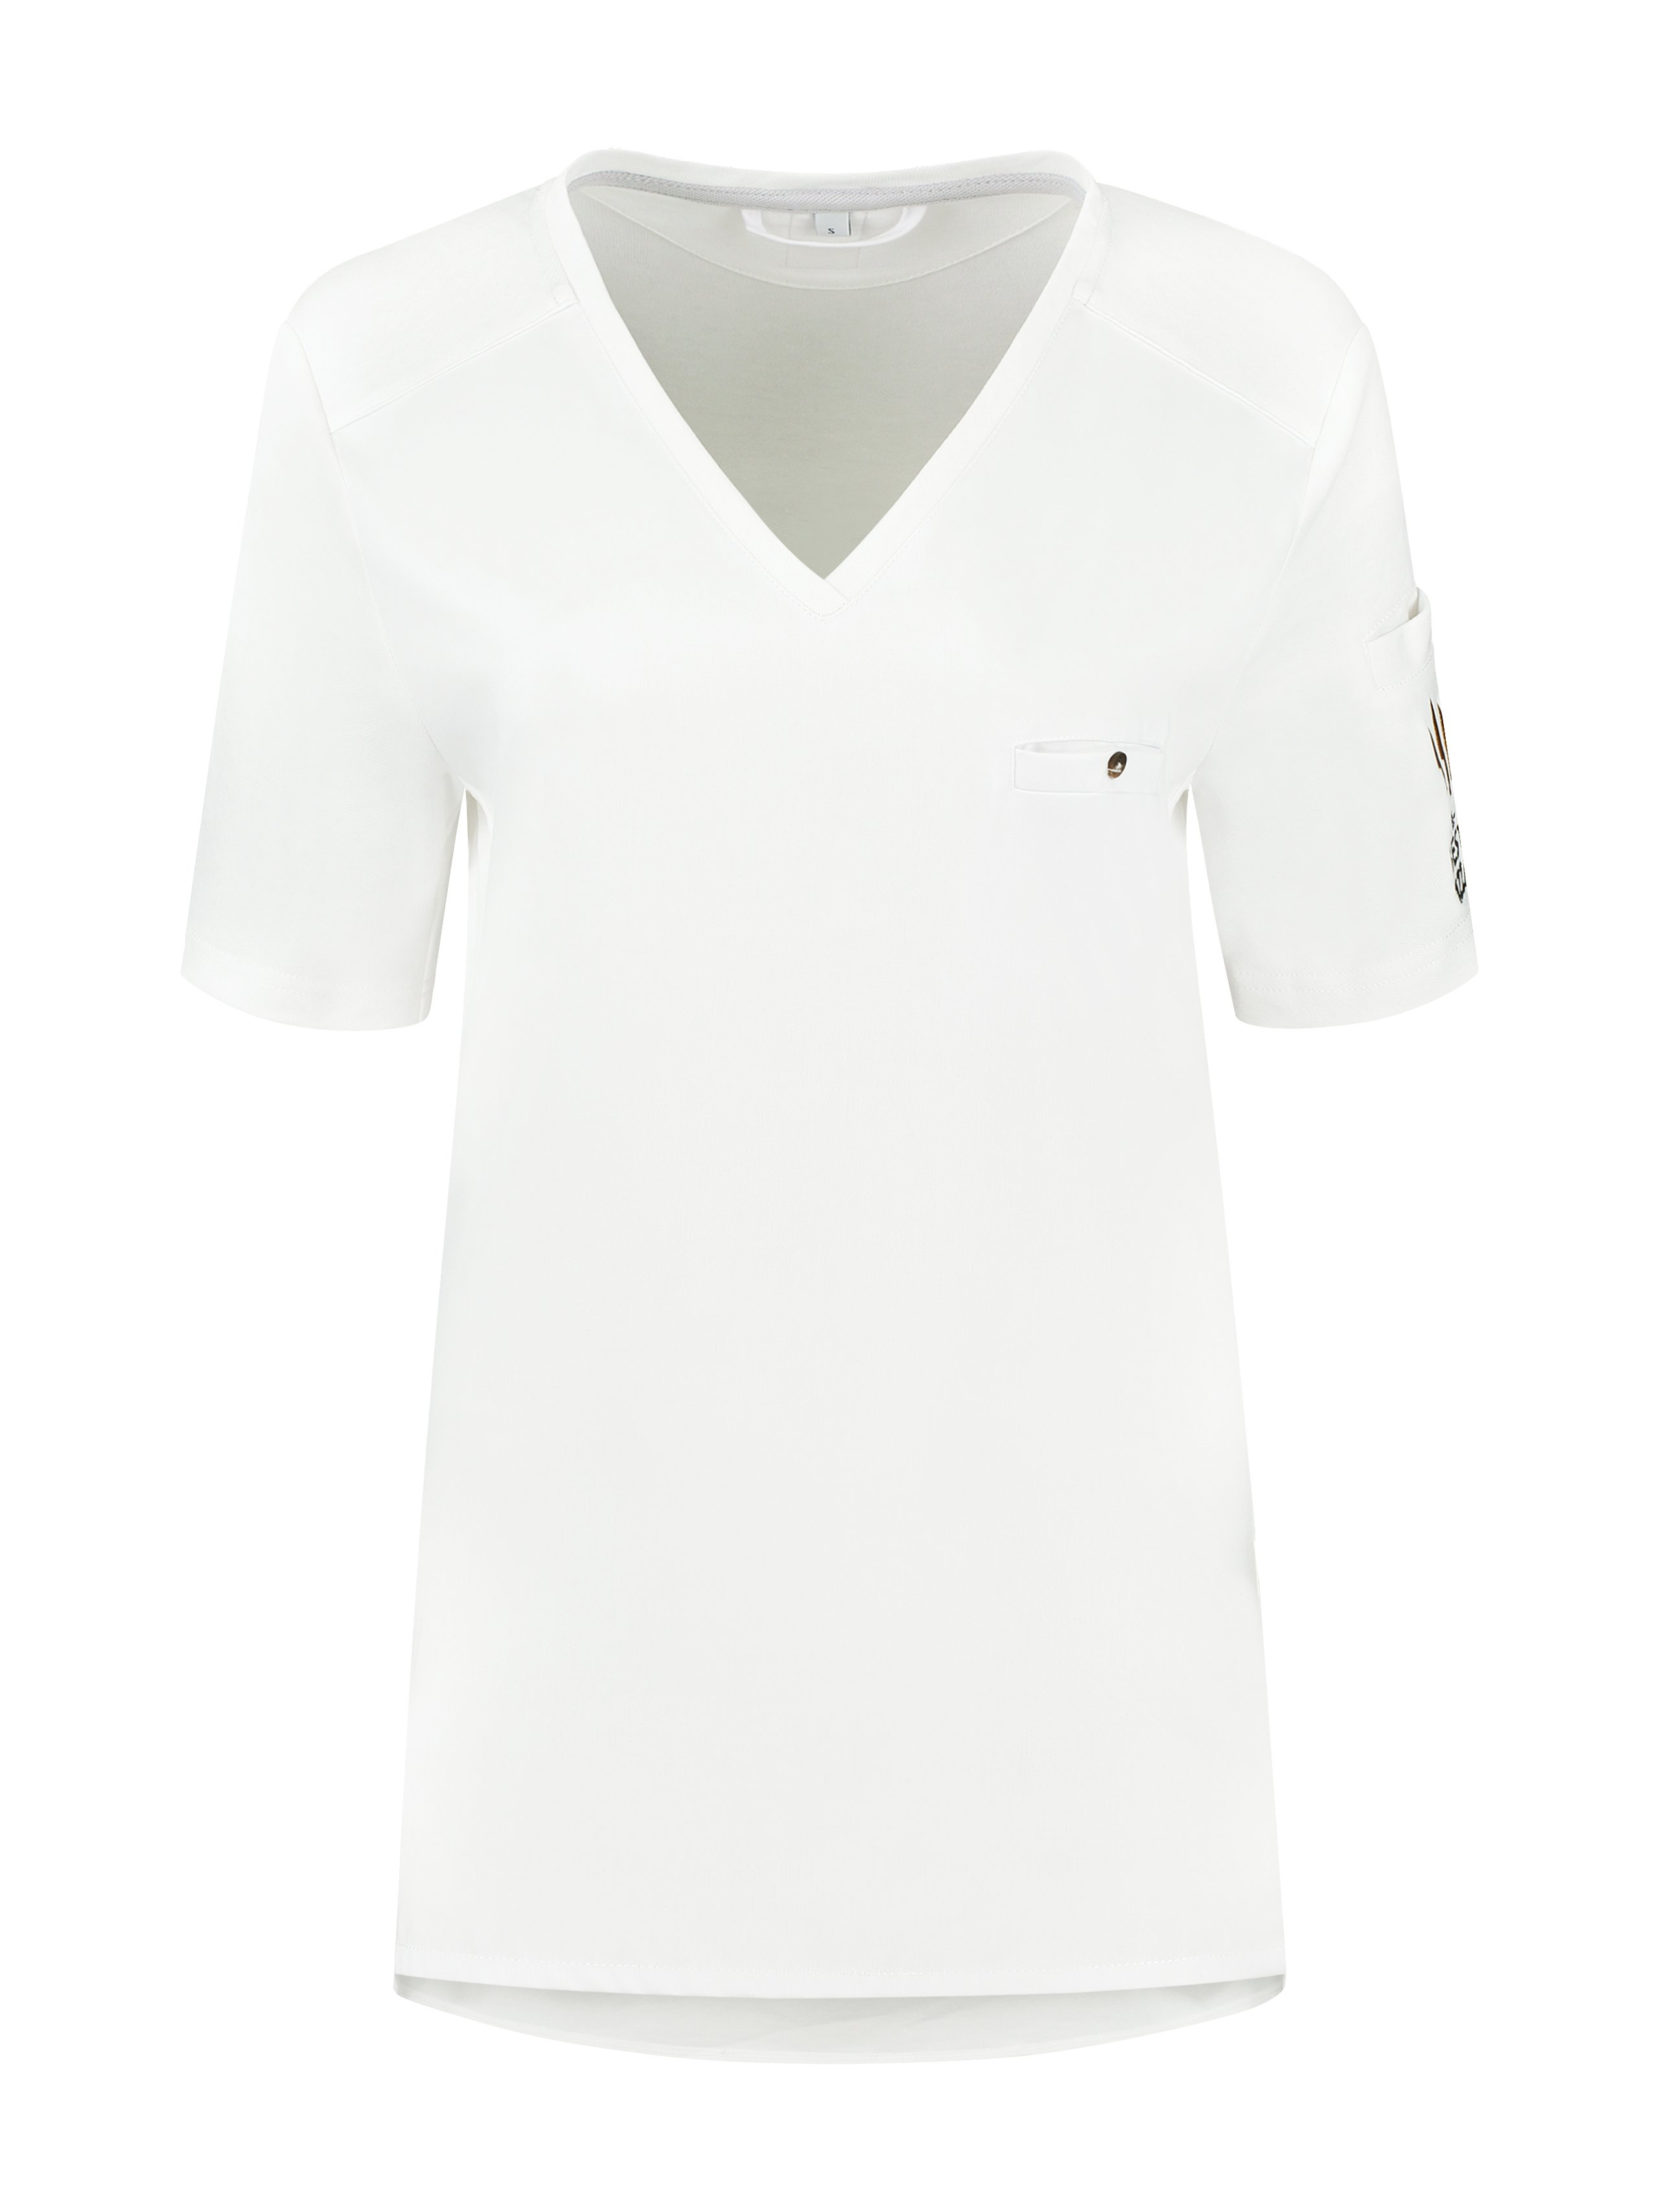 Chef Shirt The Best Pizza Fae White